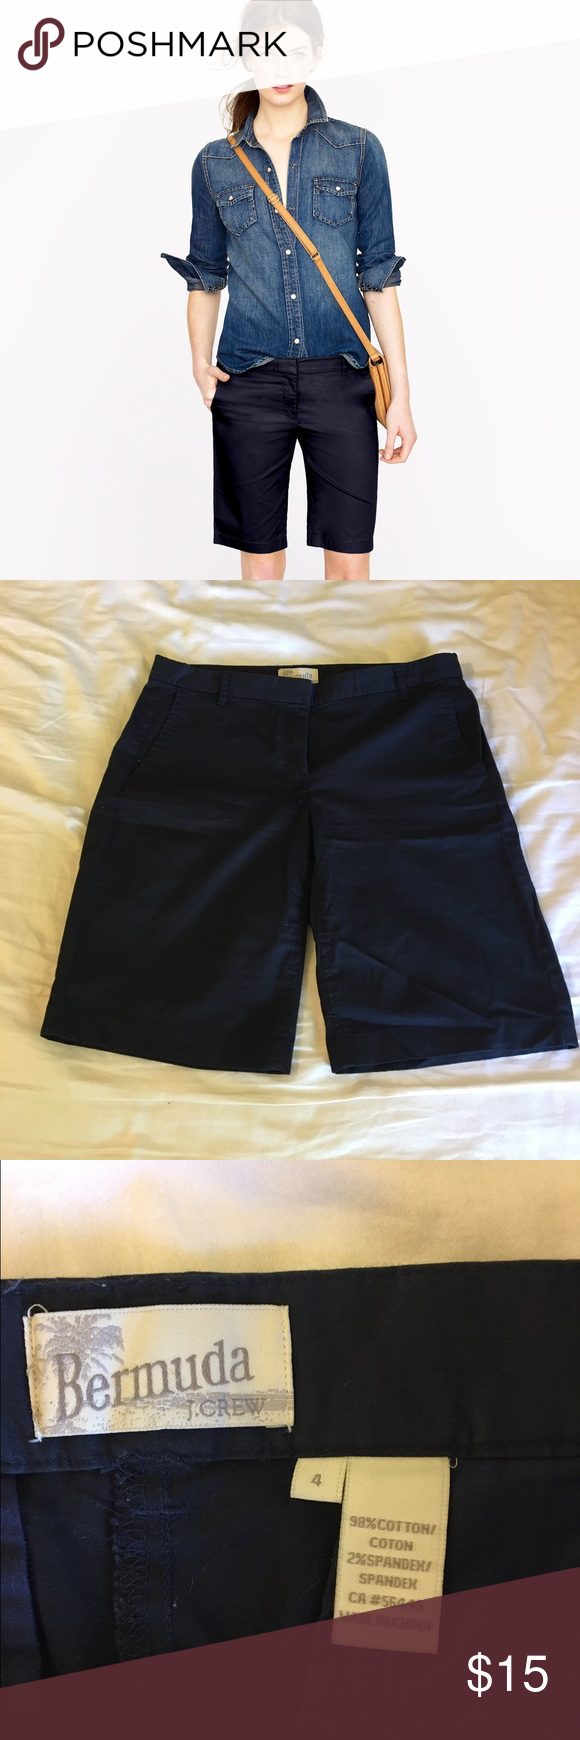 J.Crew Bamuda pants Navy size 4✨🌺 J.Crew Bamuda pants navy size 4. ✨🙂 Worn only a few times, good condition! Inseam 9.5. J. Crew Pants Capris